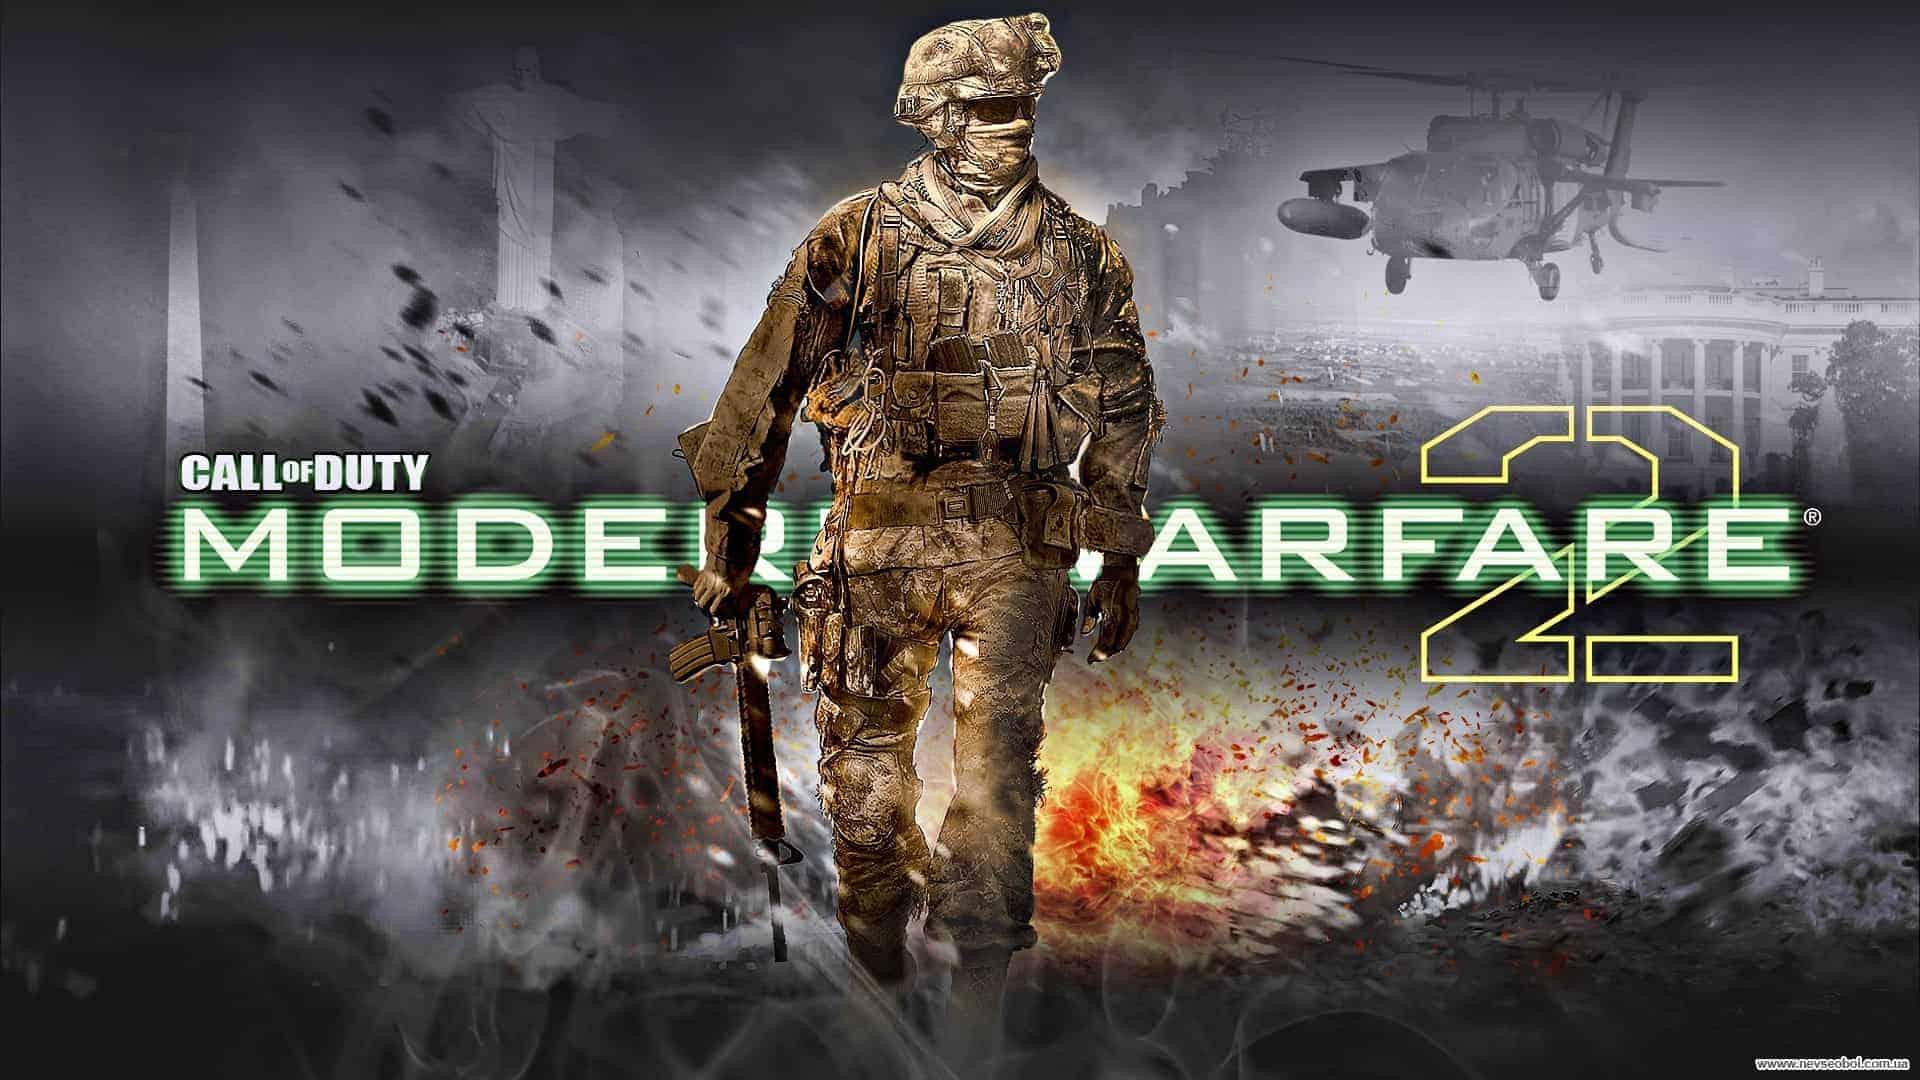 Call of Duty Modern Warfare 2 spiele herunterladen frei PC